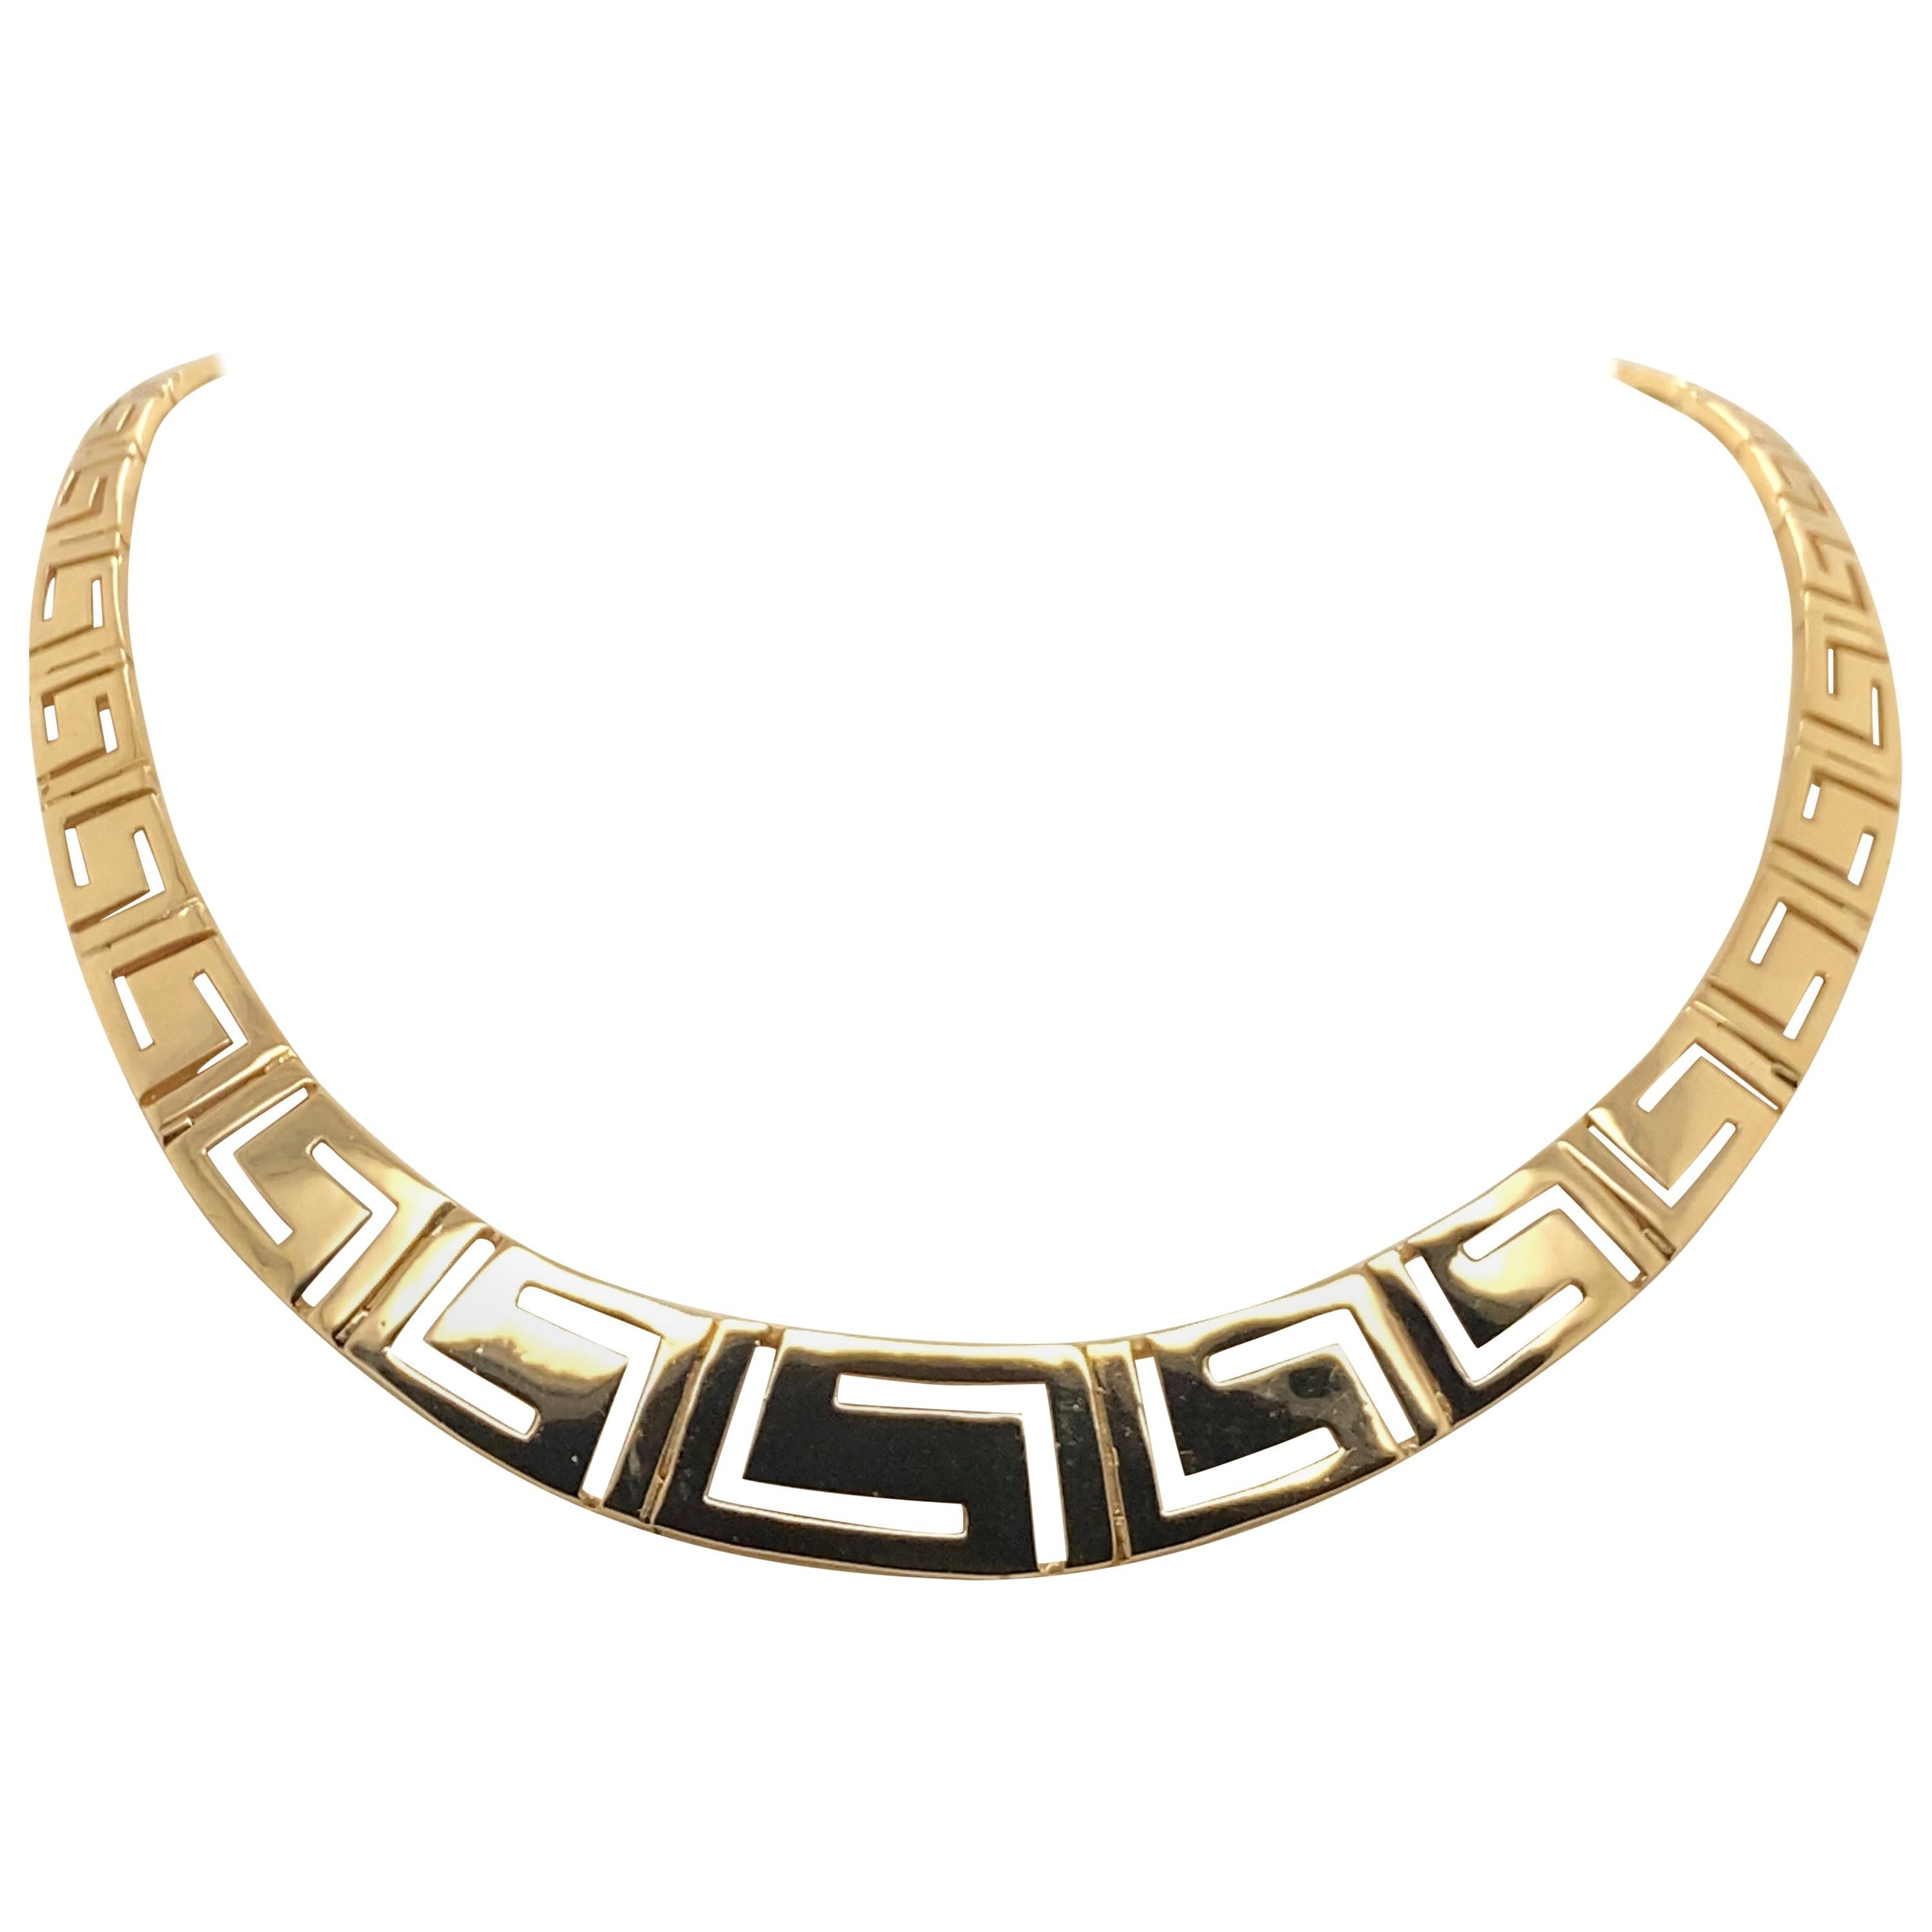 Vintage 1990s 14 Karat Yellow Gold Greek Key Necklace